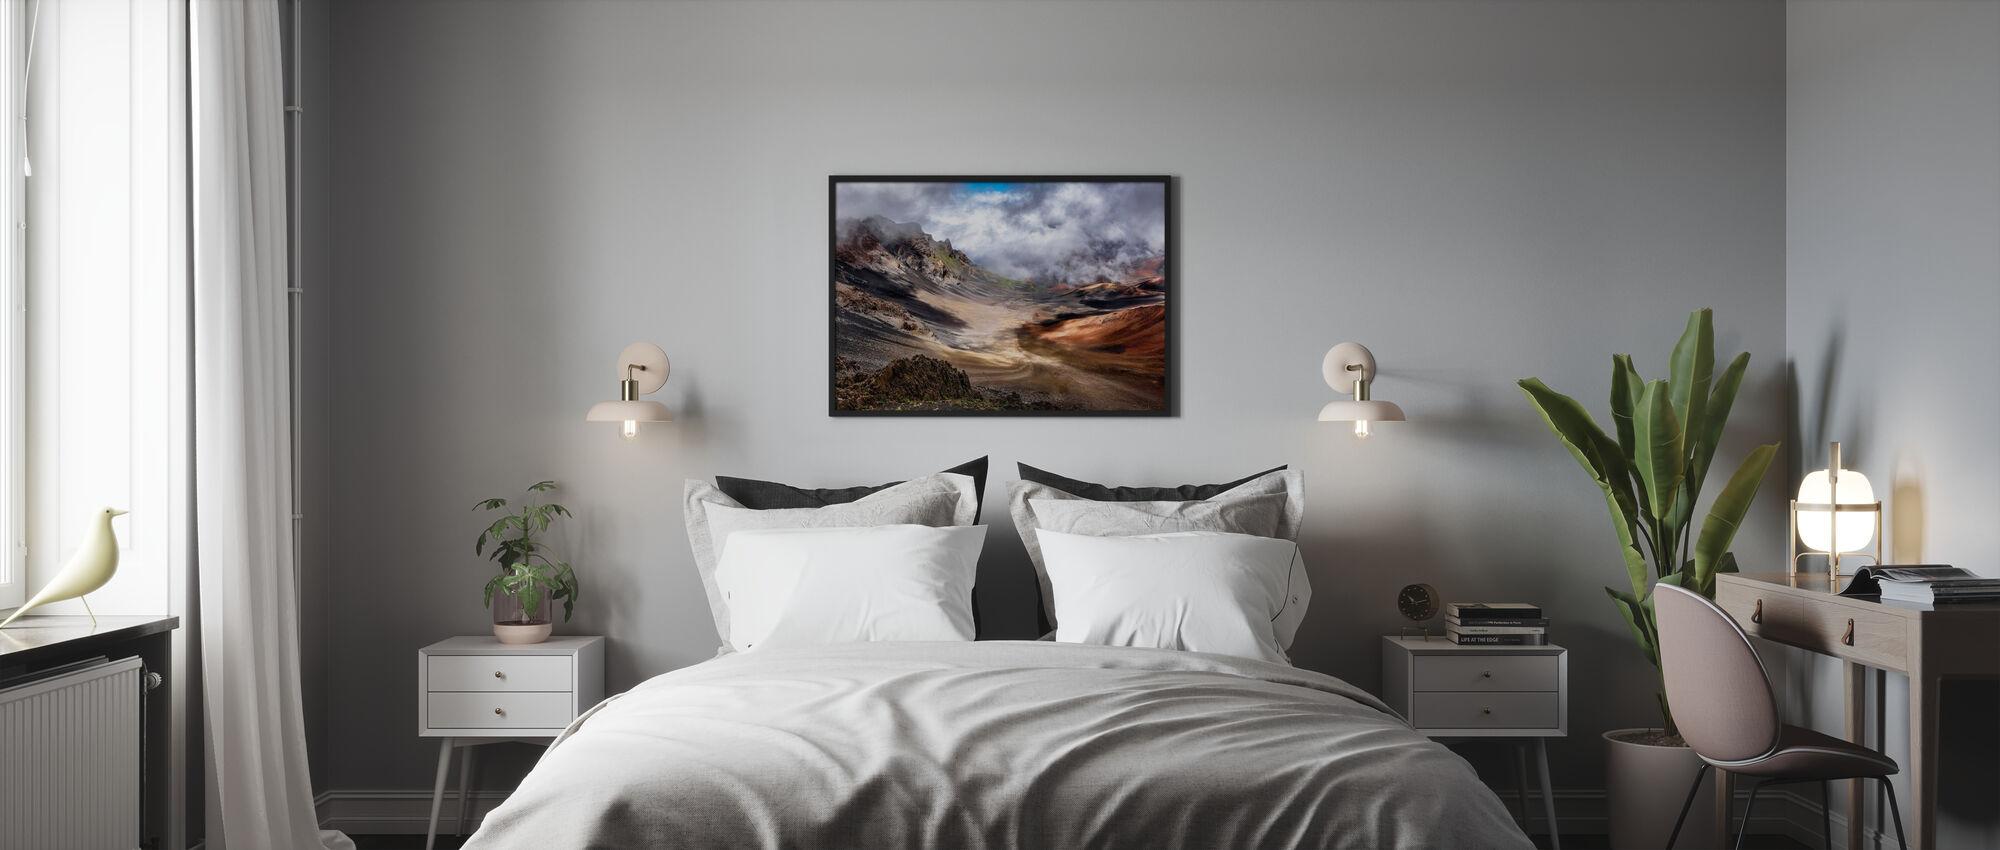 Kraters Rand - Ingelijste print - Slaapkamer